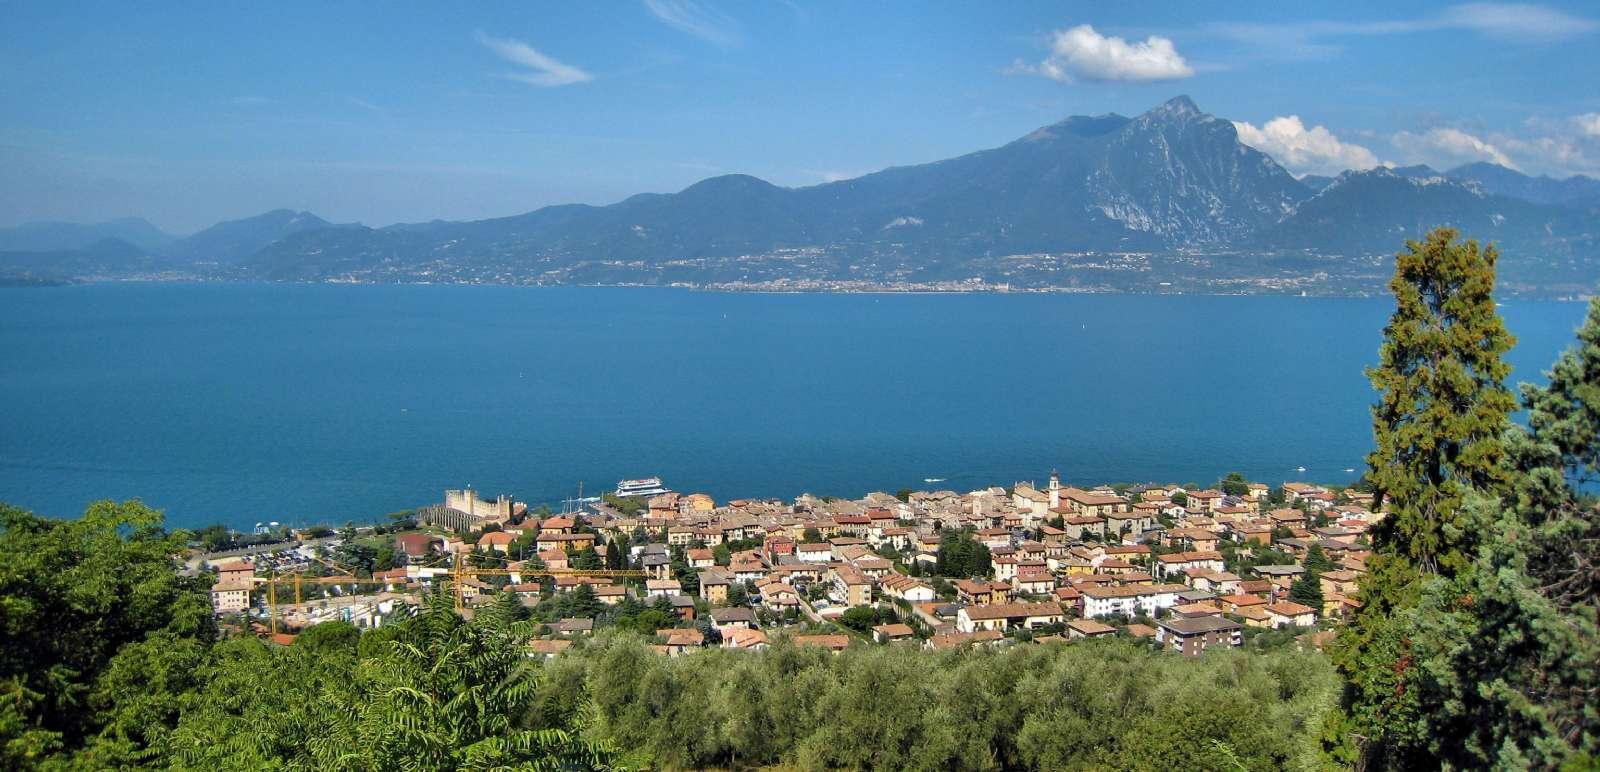 Torri del Benaco Blick auf das Dorf von Albisano